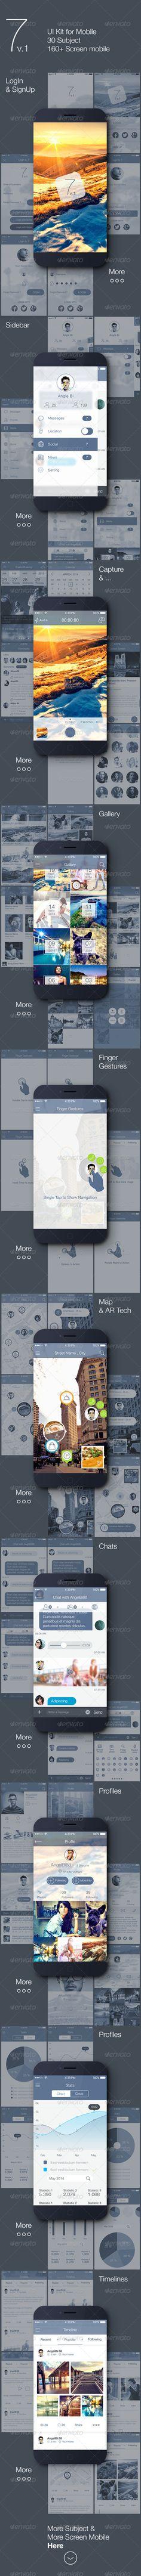 7 v.1 - Mobile UI Kit Template PSD #design Download: http://graphicriver.net/item/7-v1-mobile-ui-kit/7518884?ref=ksioks